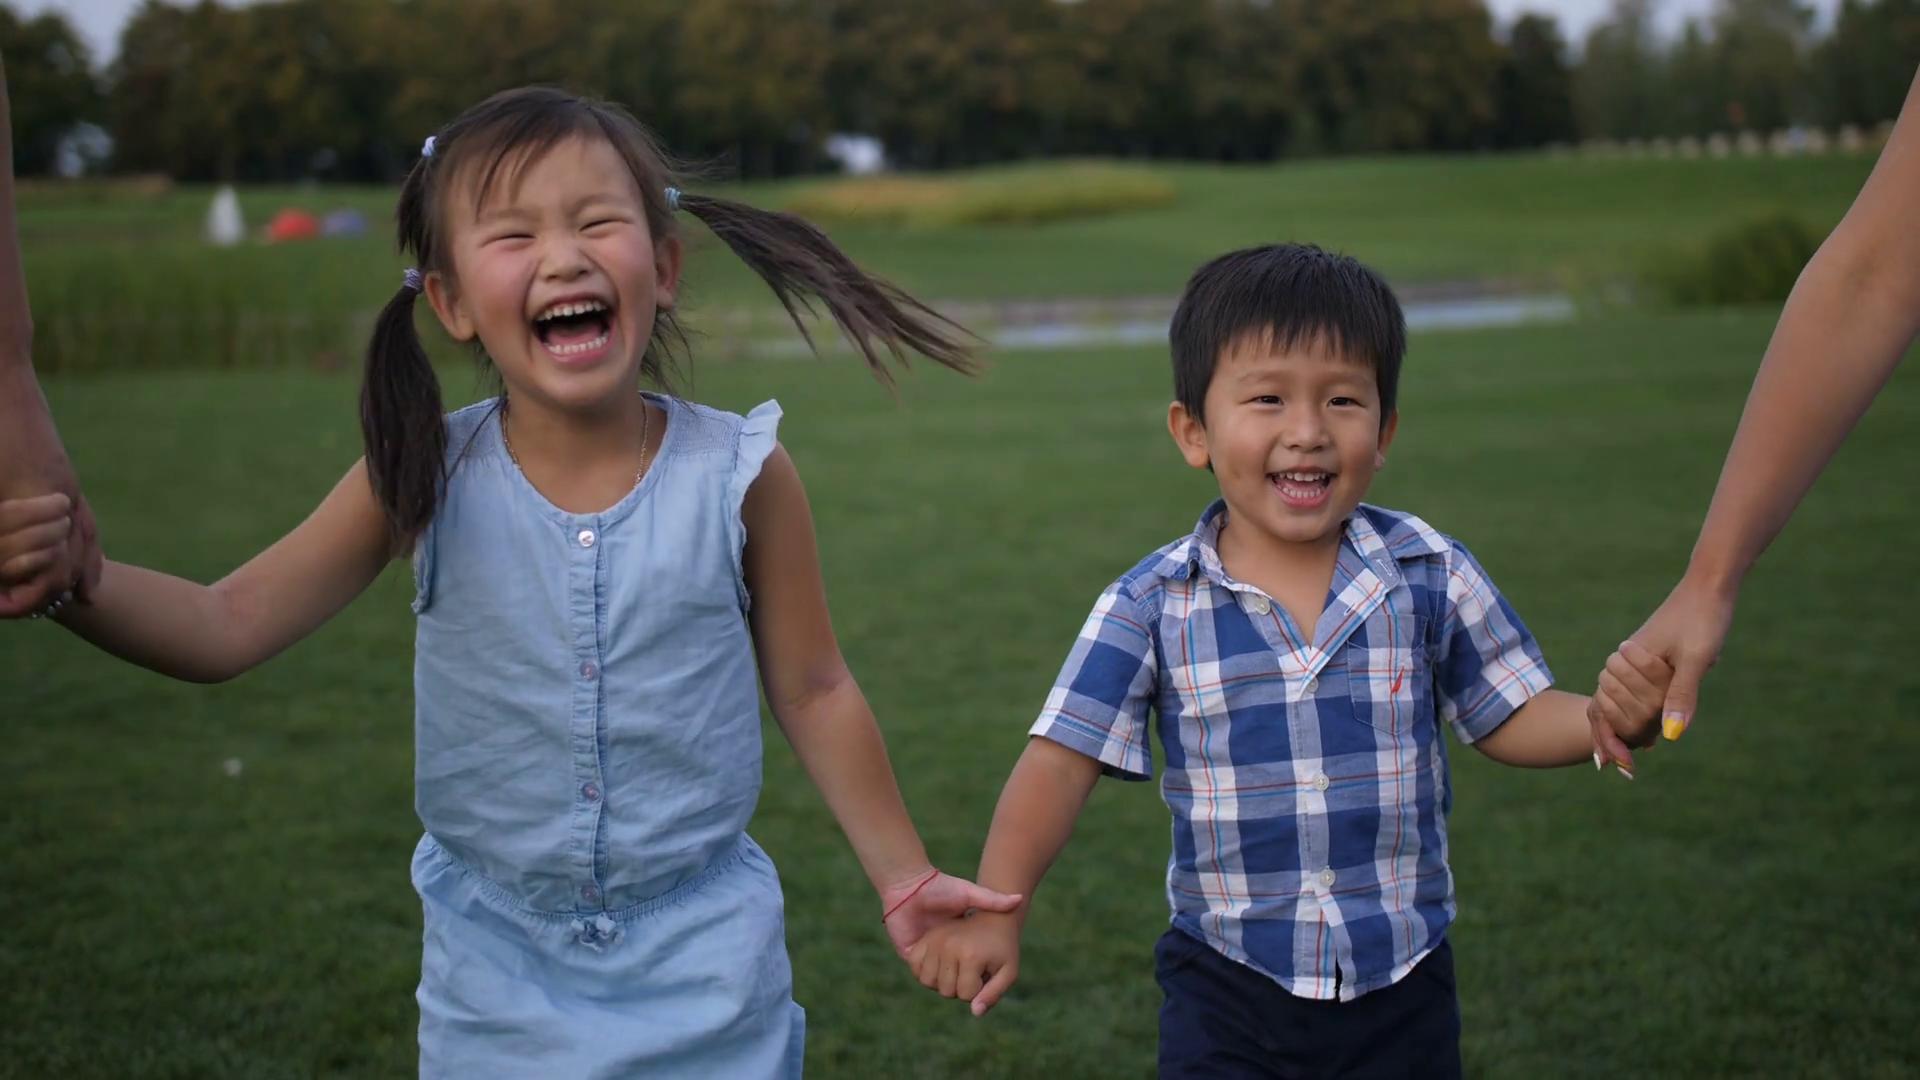 videoblocks-adorable-laughing-asian-siblings-holding-han